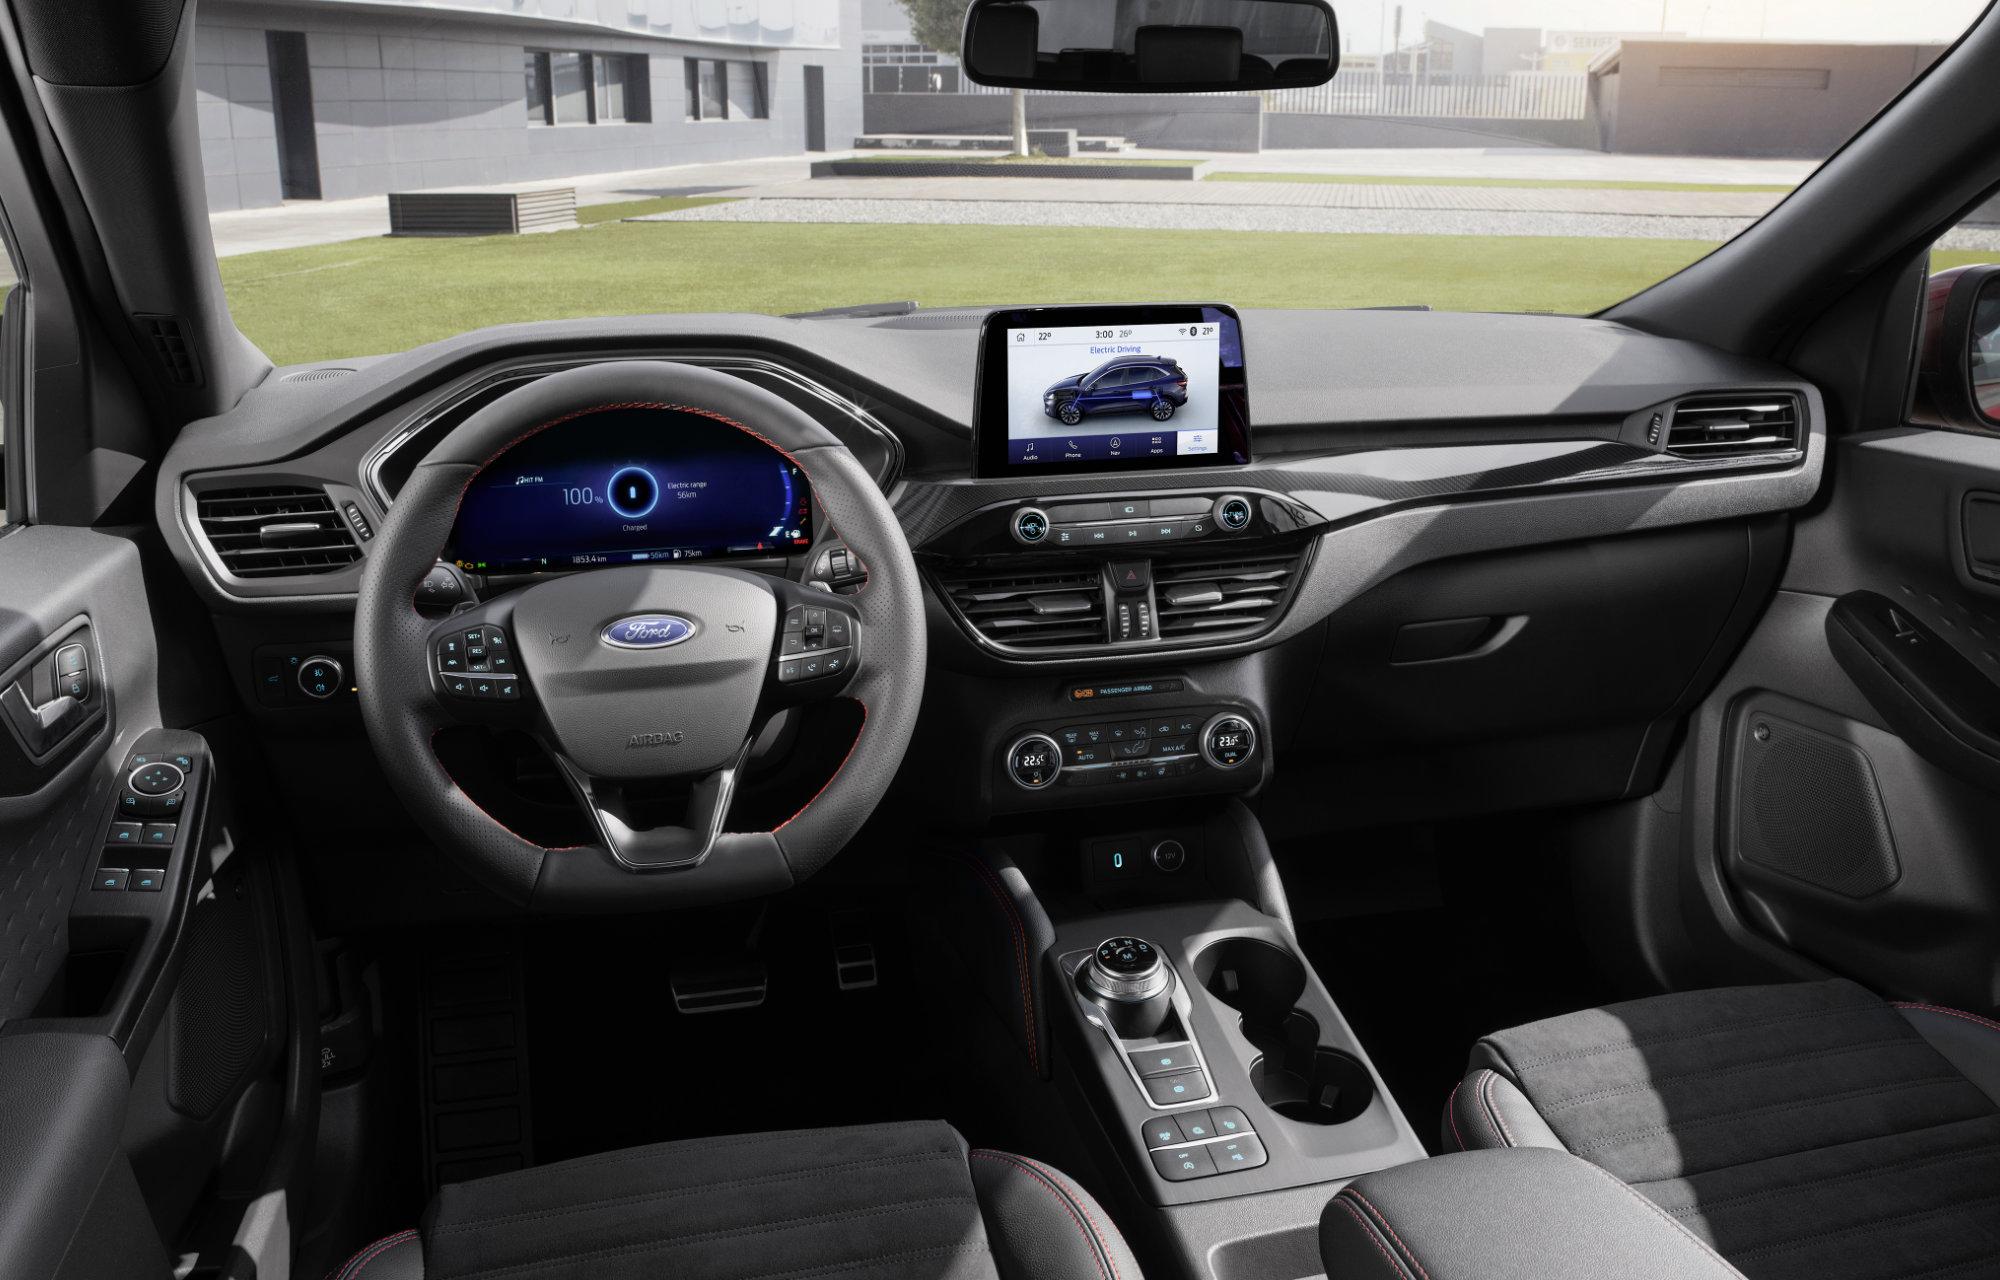 Uusi Ford Kuga ladattava Hybridi